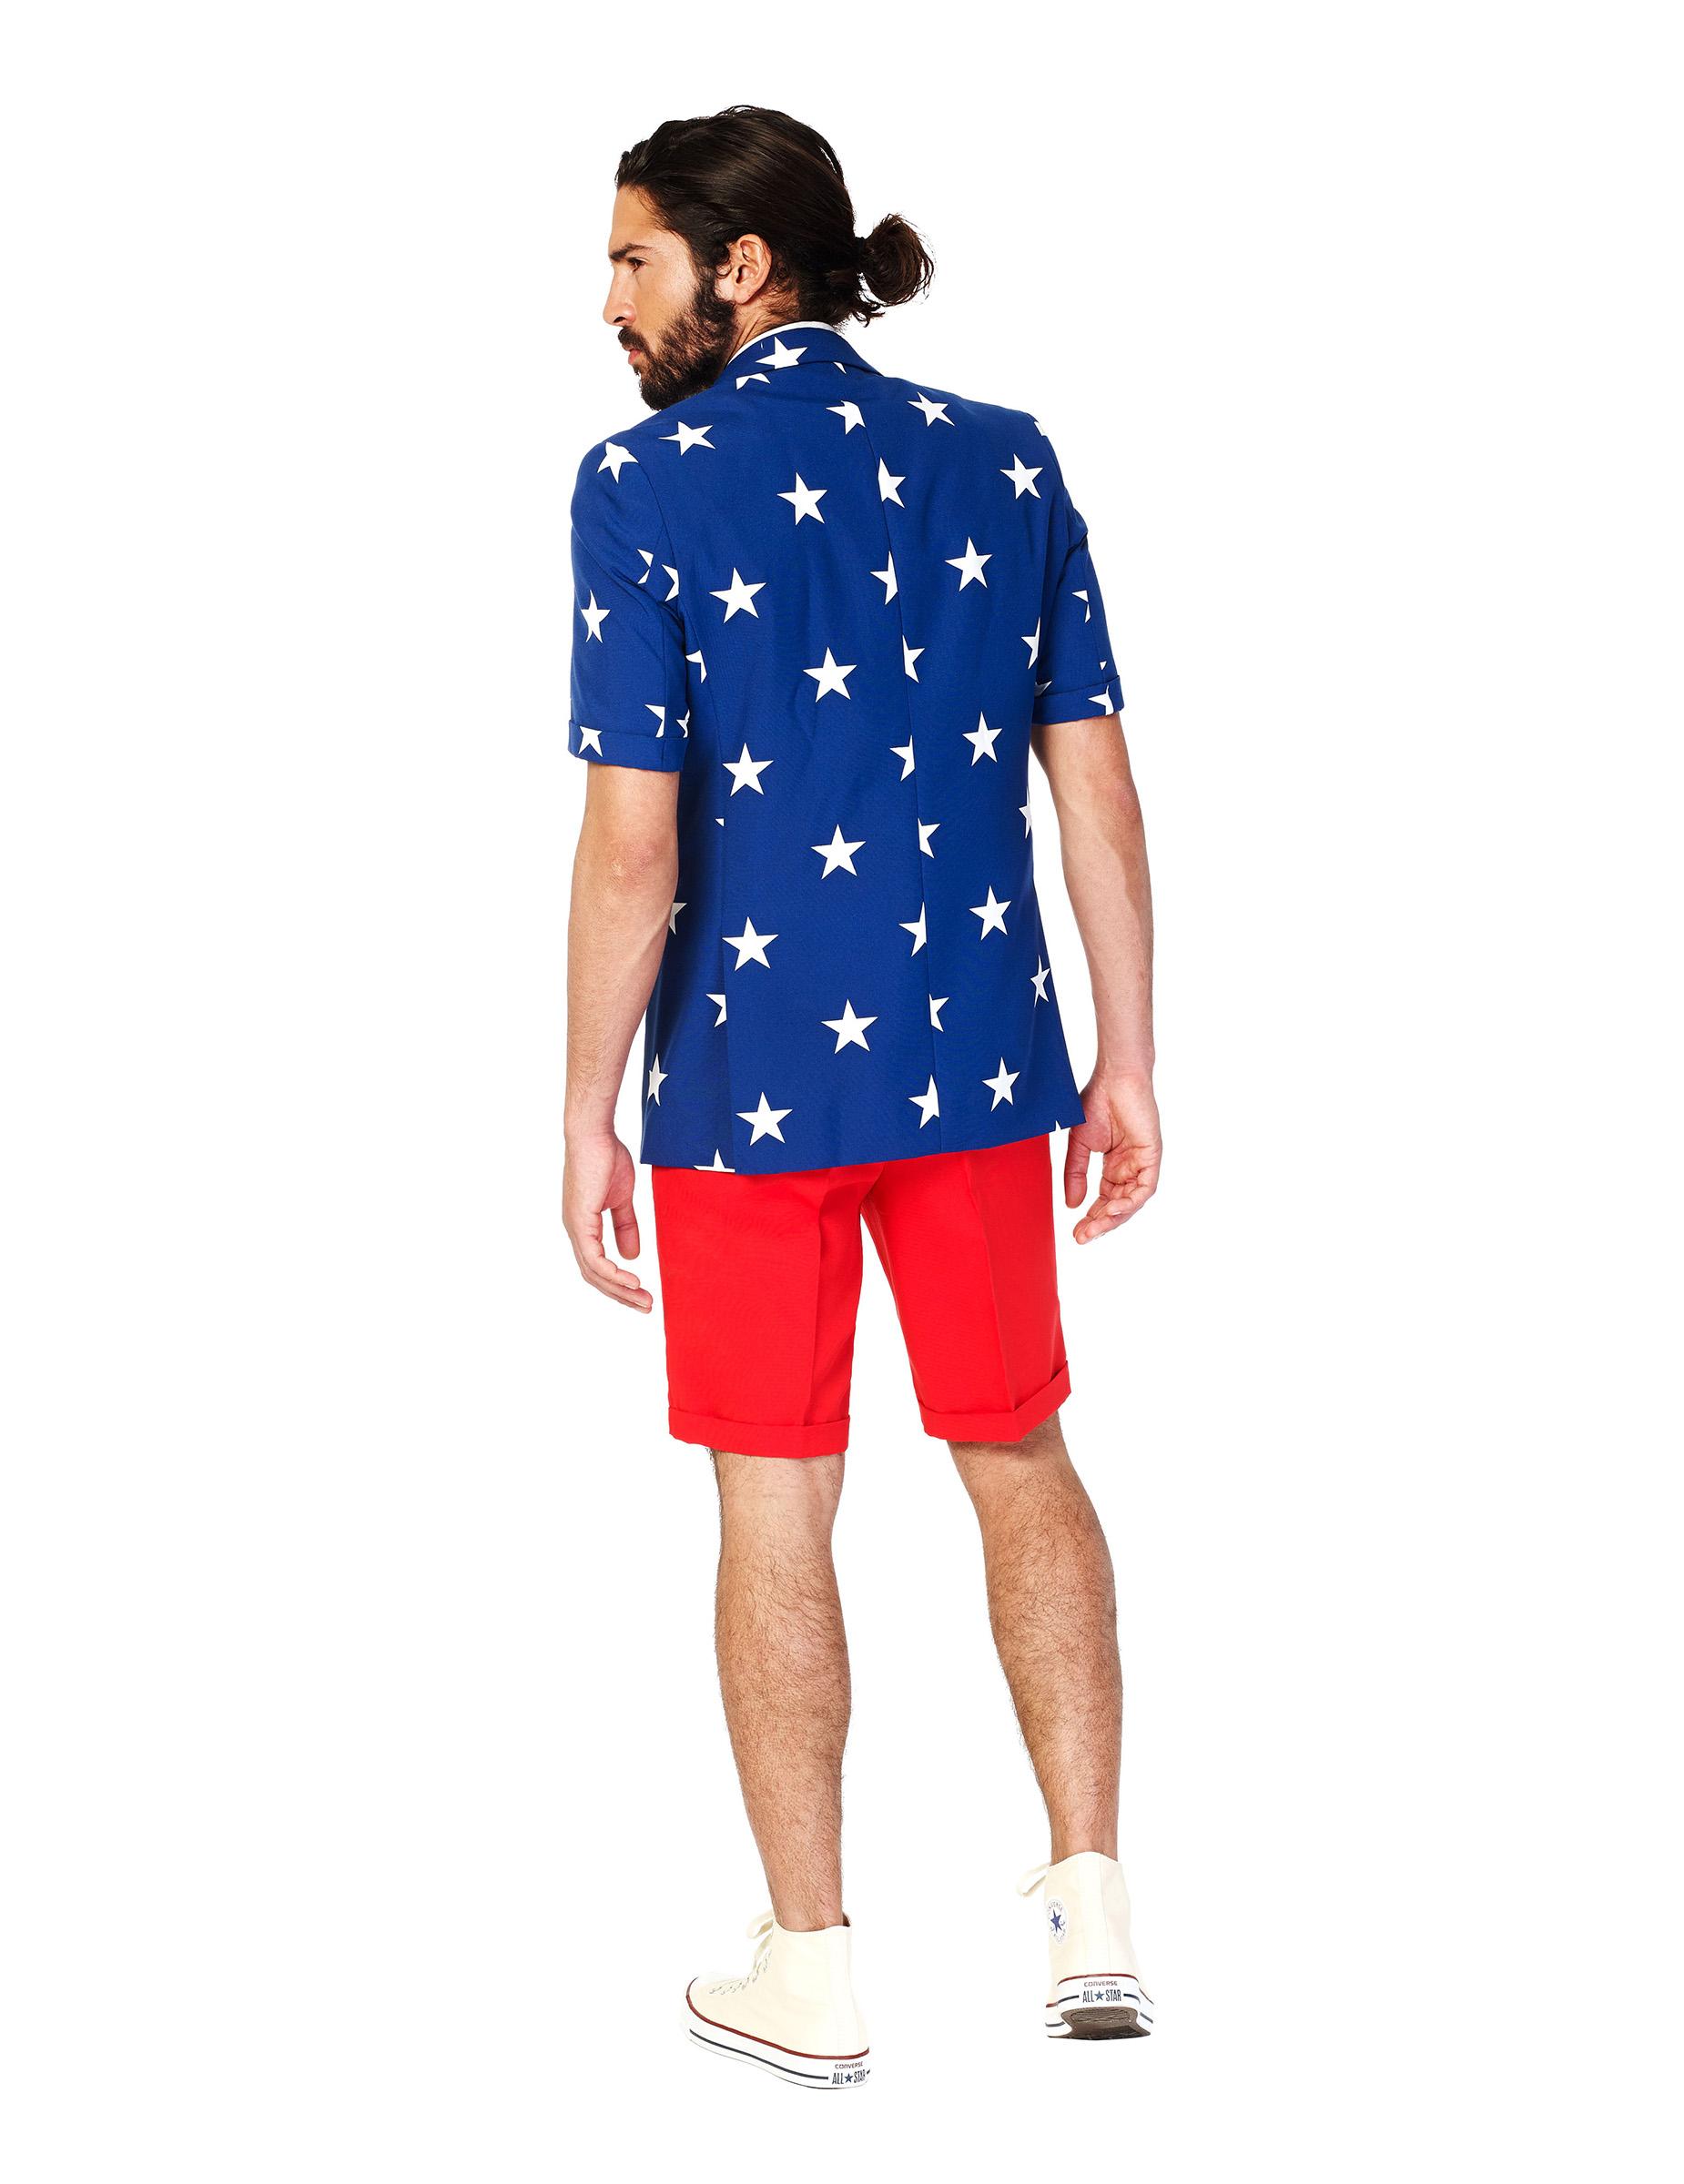 opposuits sommeranzug f r herren amerika anzug blau weiss rot g nstige faschings kost me bei. Black Bedroom Furniture Sets. Home Design Ideas